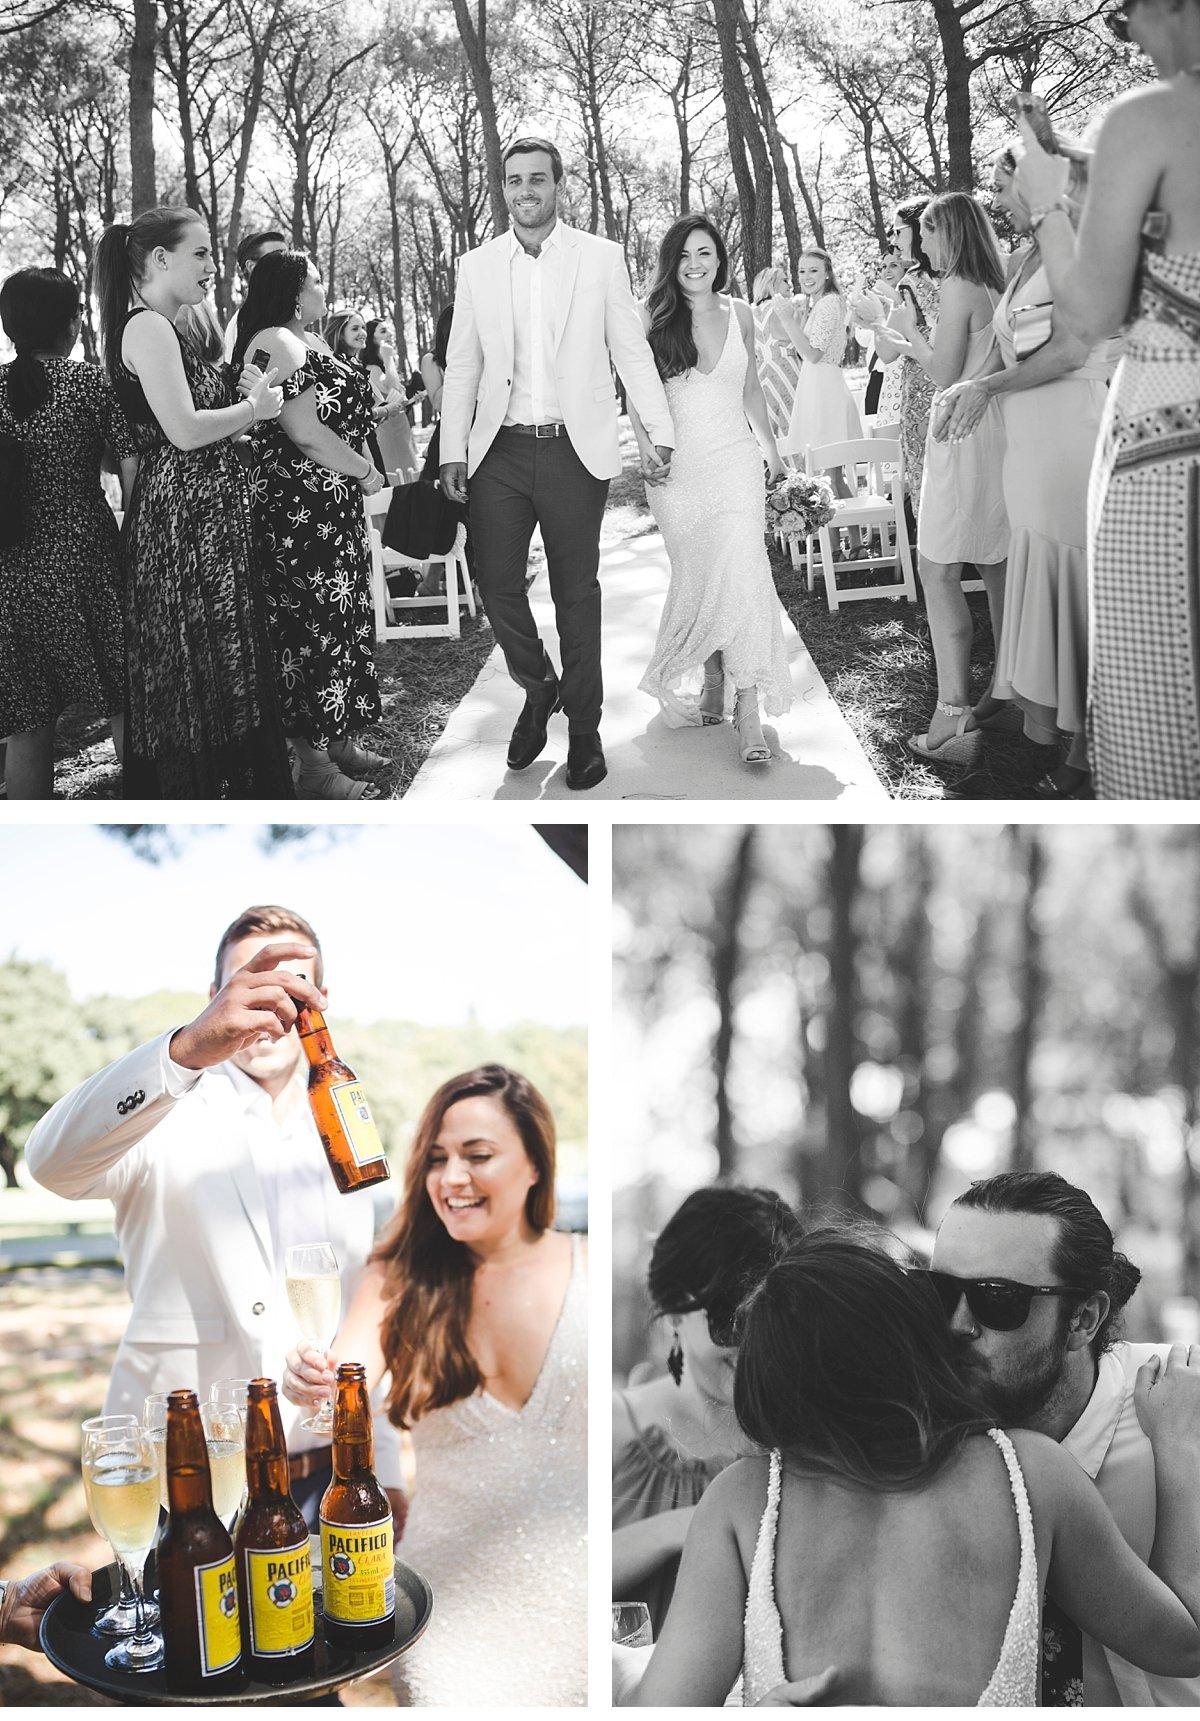 Wagga Wagga Wedding Photographer Sydney Wedding Bondi Beach Australian Wedding Photographer_0407